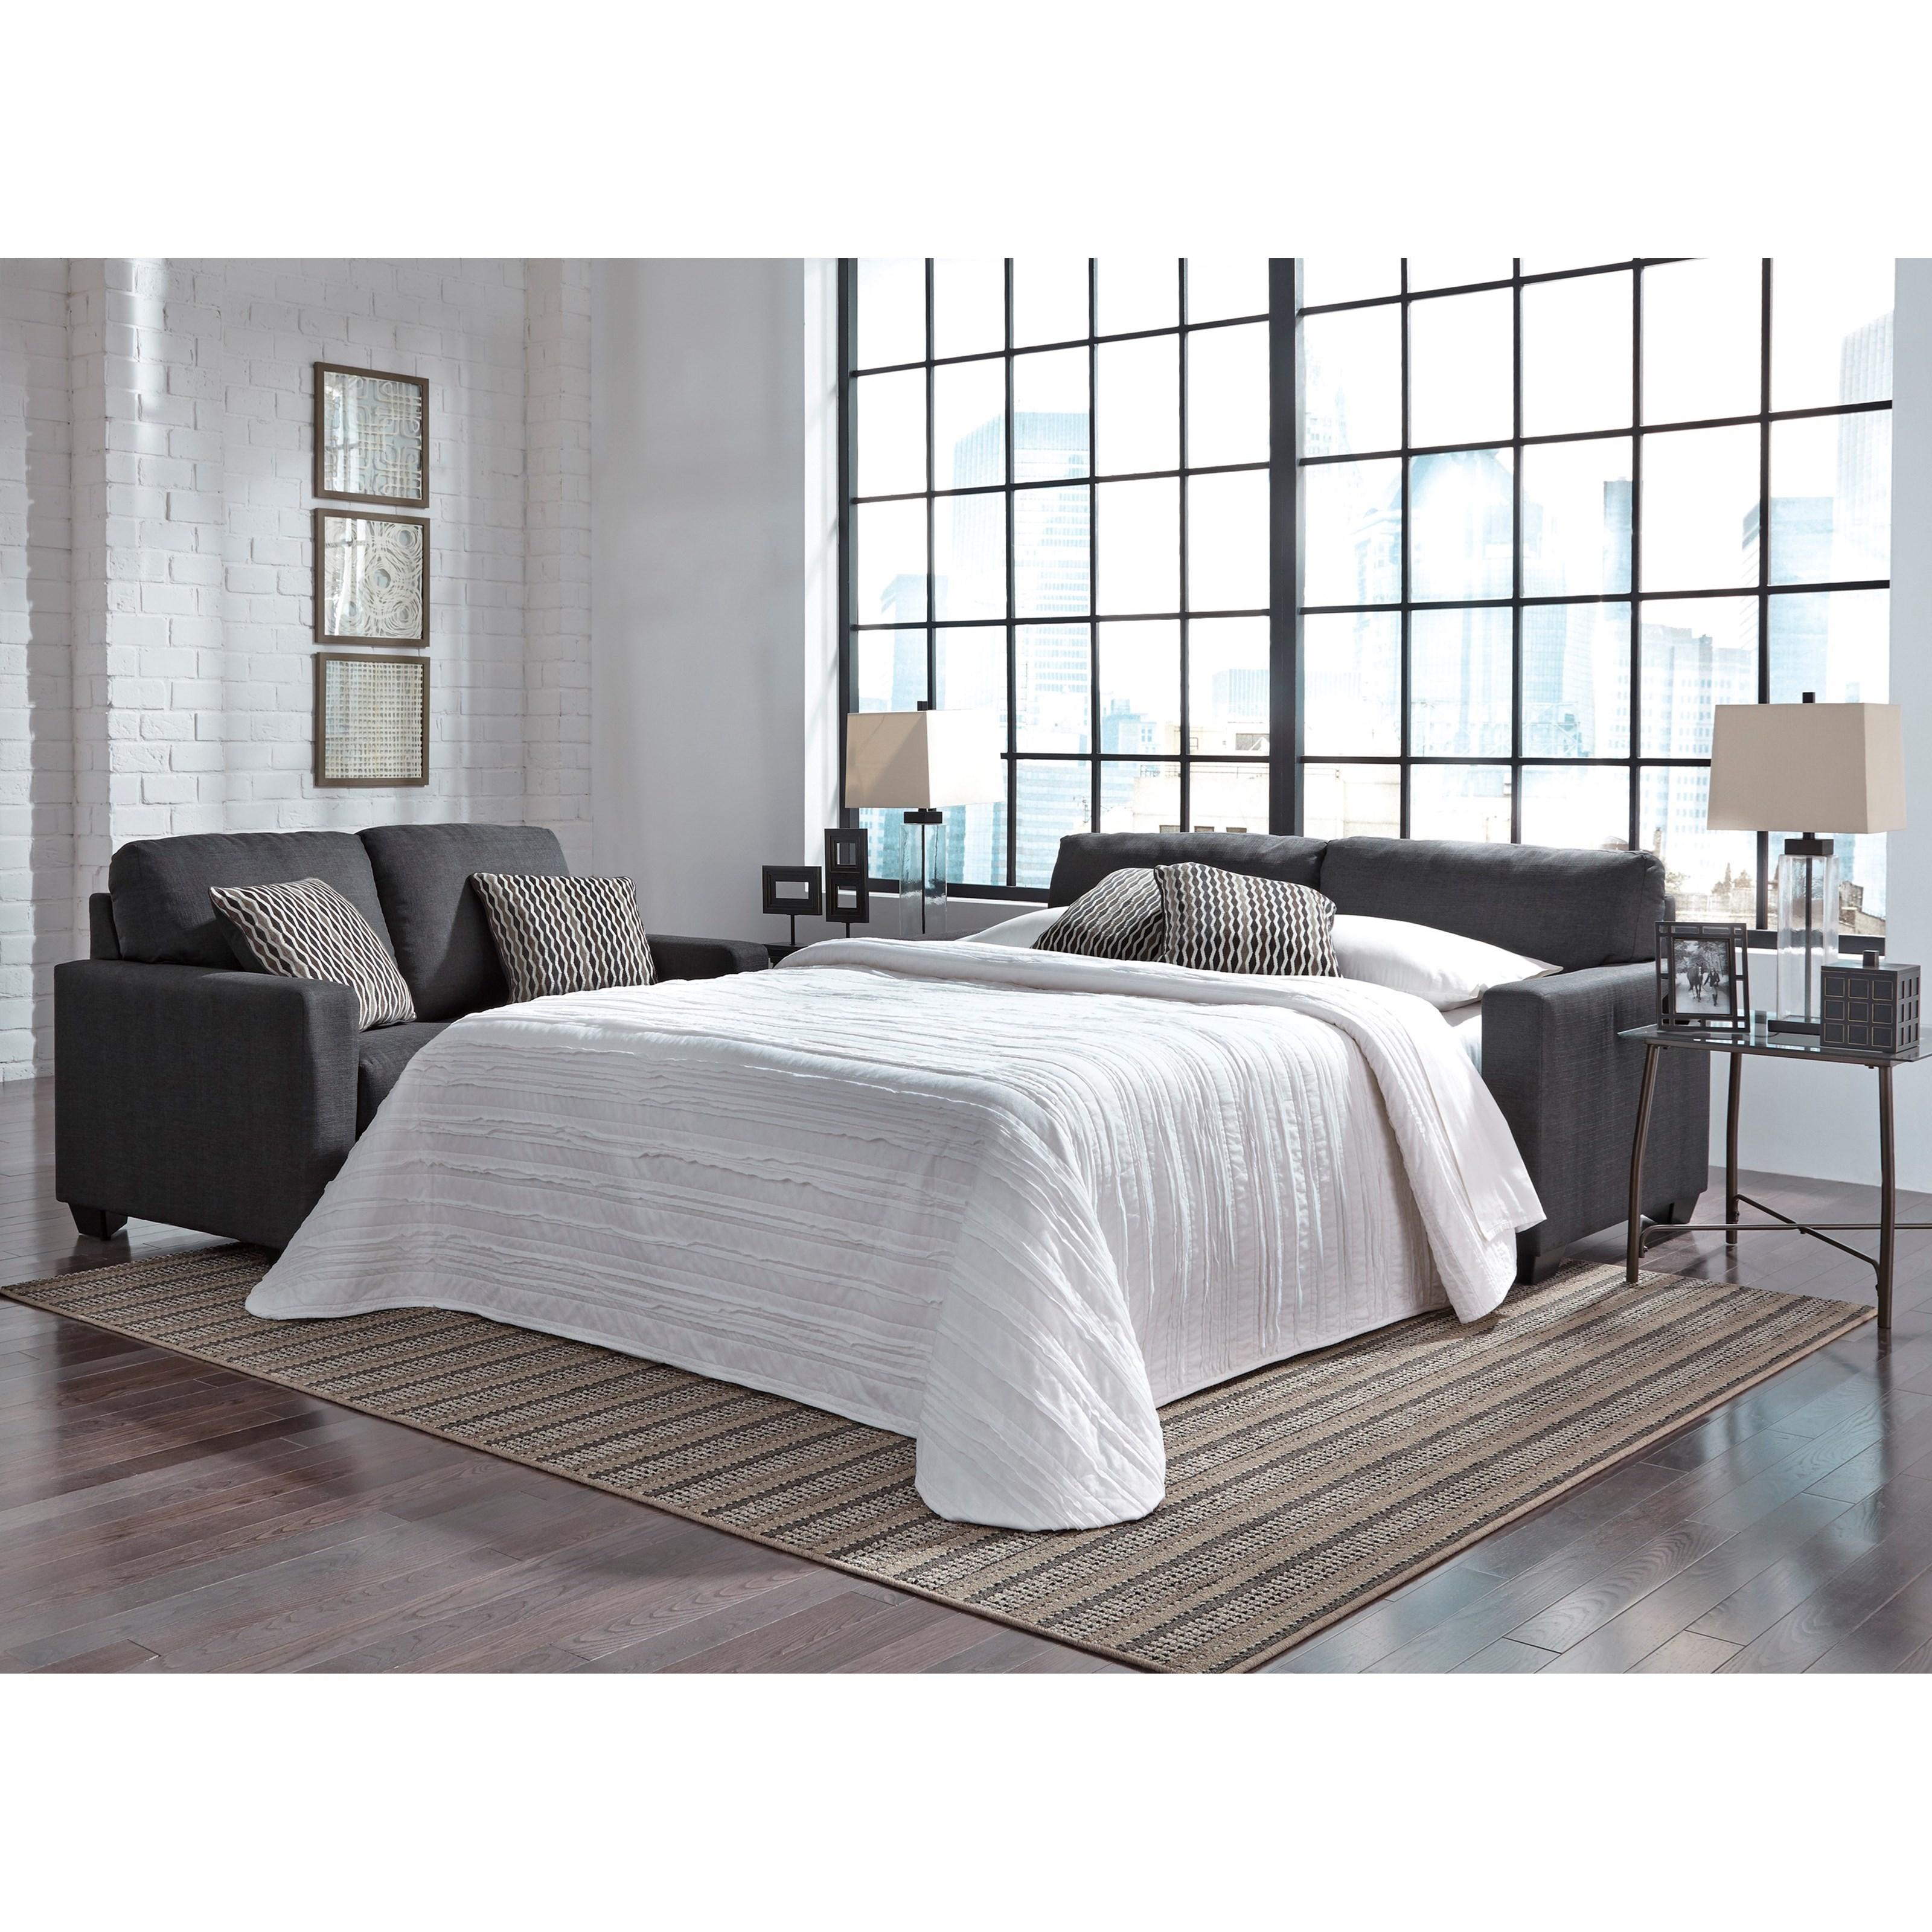 Del Sol AB Bavello 9730136 Contemporary Full Sofa Sleeper